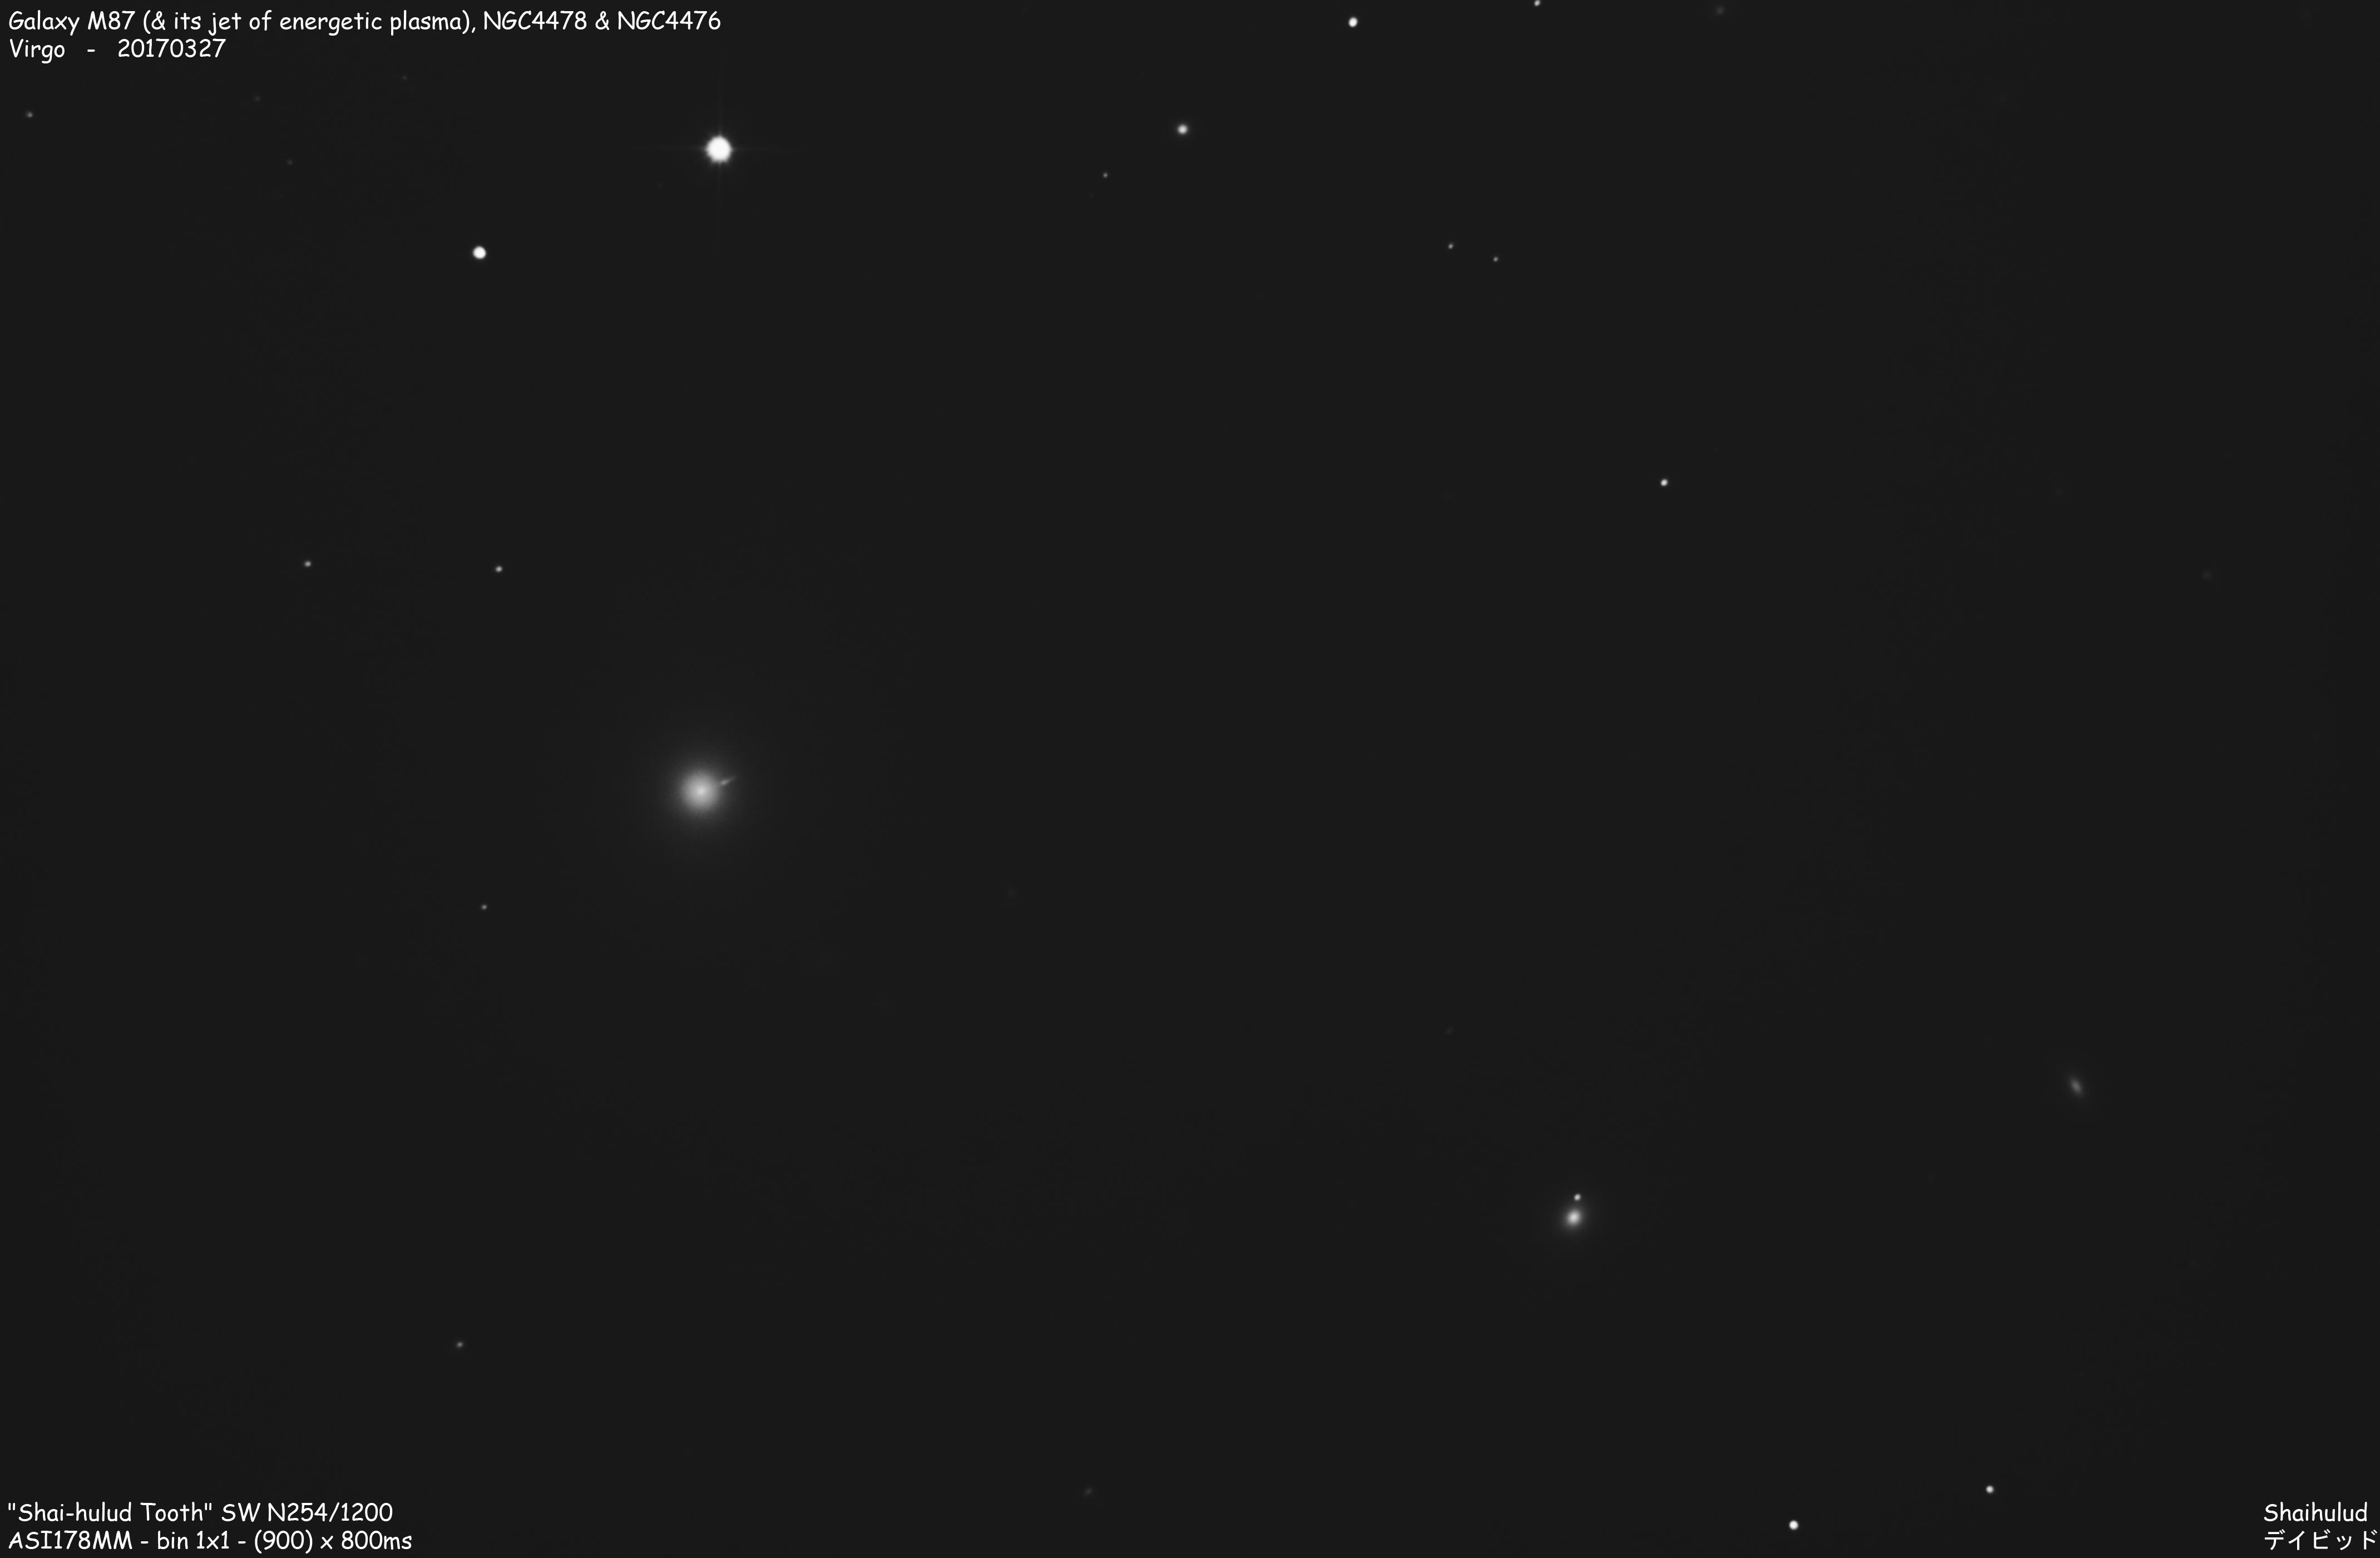 Deep Sky Planetary Technique (by Shaihulud) -CQBHDsjqgy9_16536x16536_wmhqkGbg